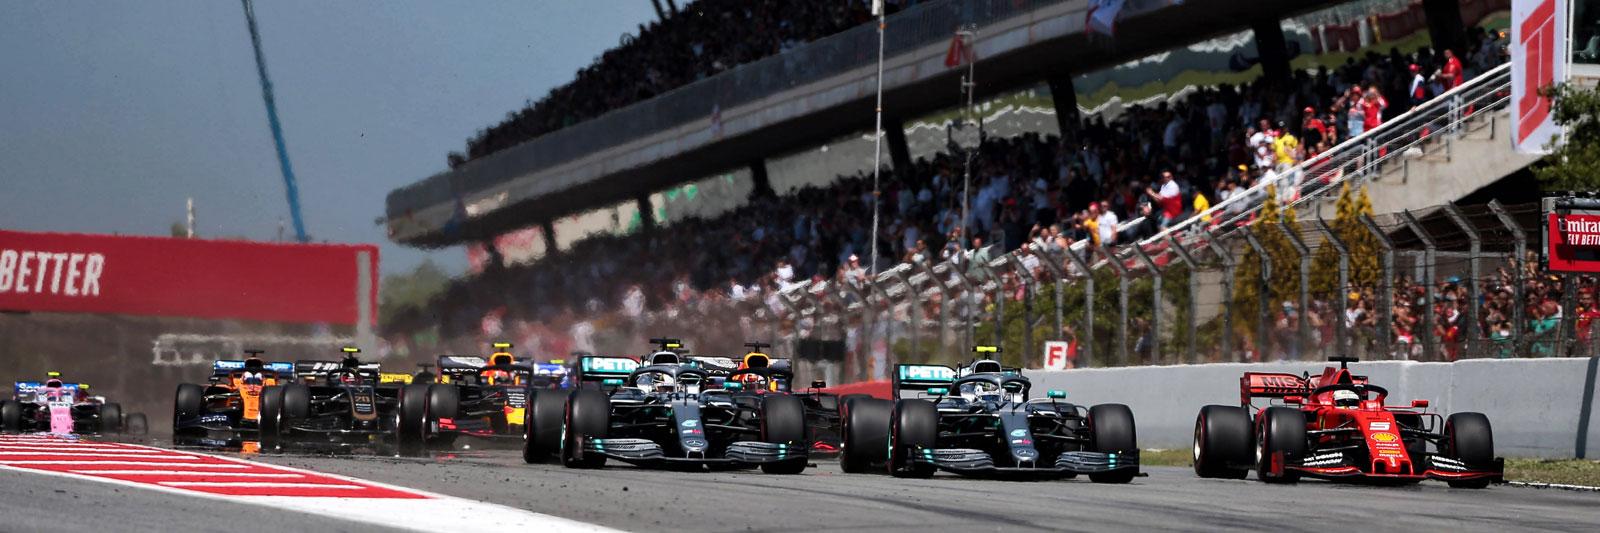 Spanish Grand Prix with Grand Prix Tours